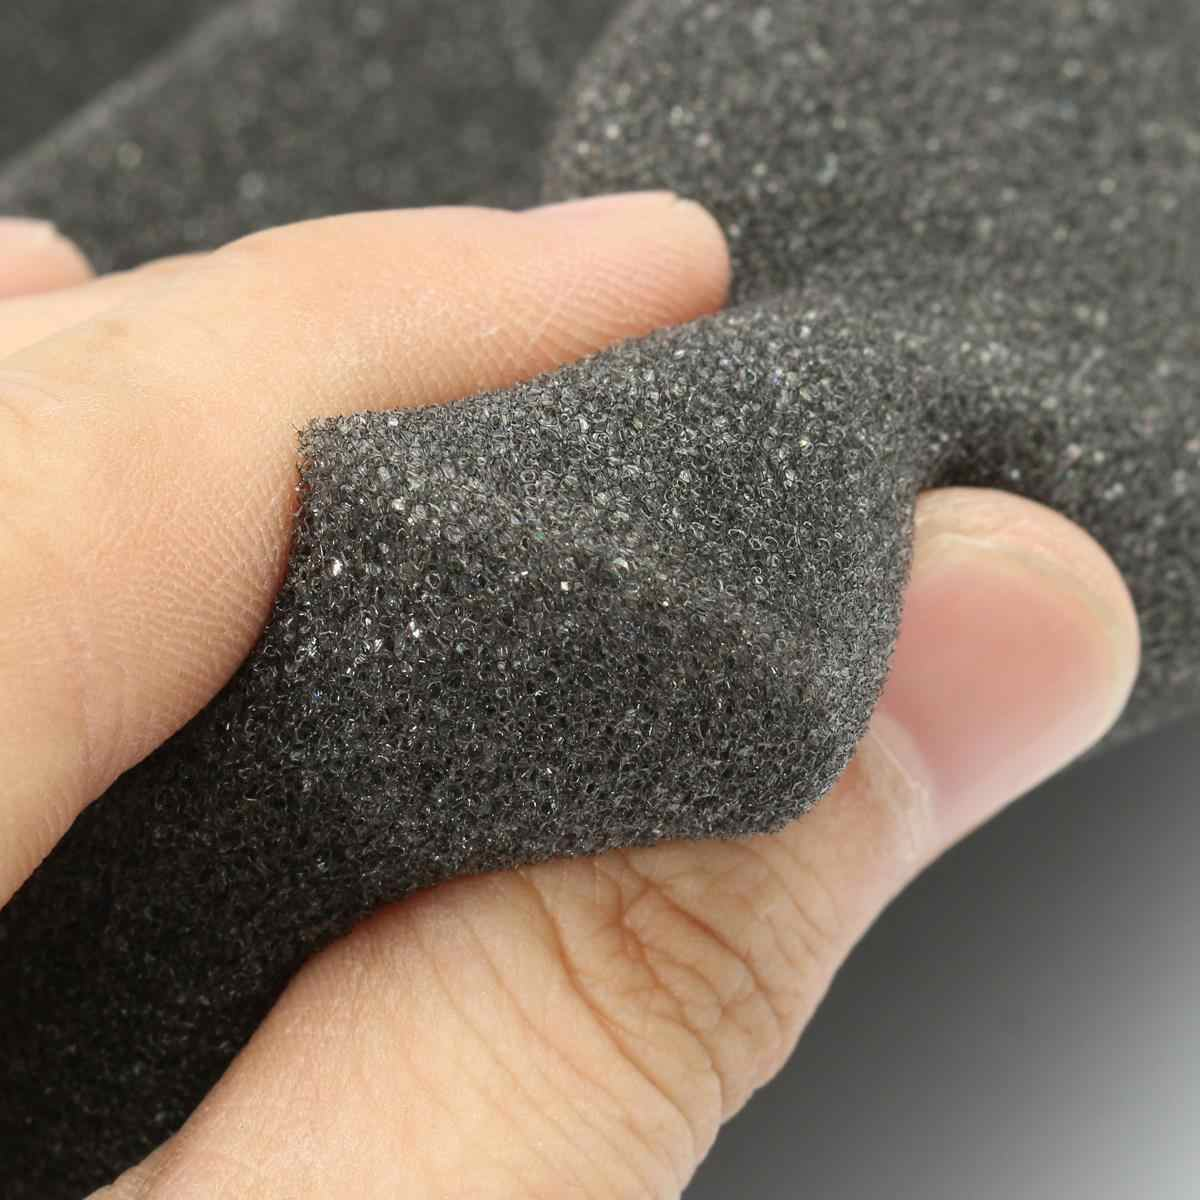 8Pcs 305 x 305 x 45mm Soundproofing Foam Acoustic Foam Sound Treatment Studio Room Absorption Wedge Tiles Polyurethane foam